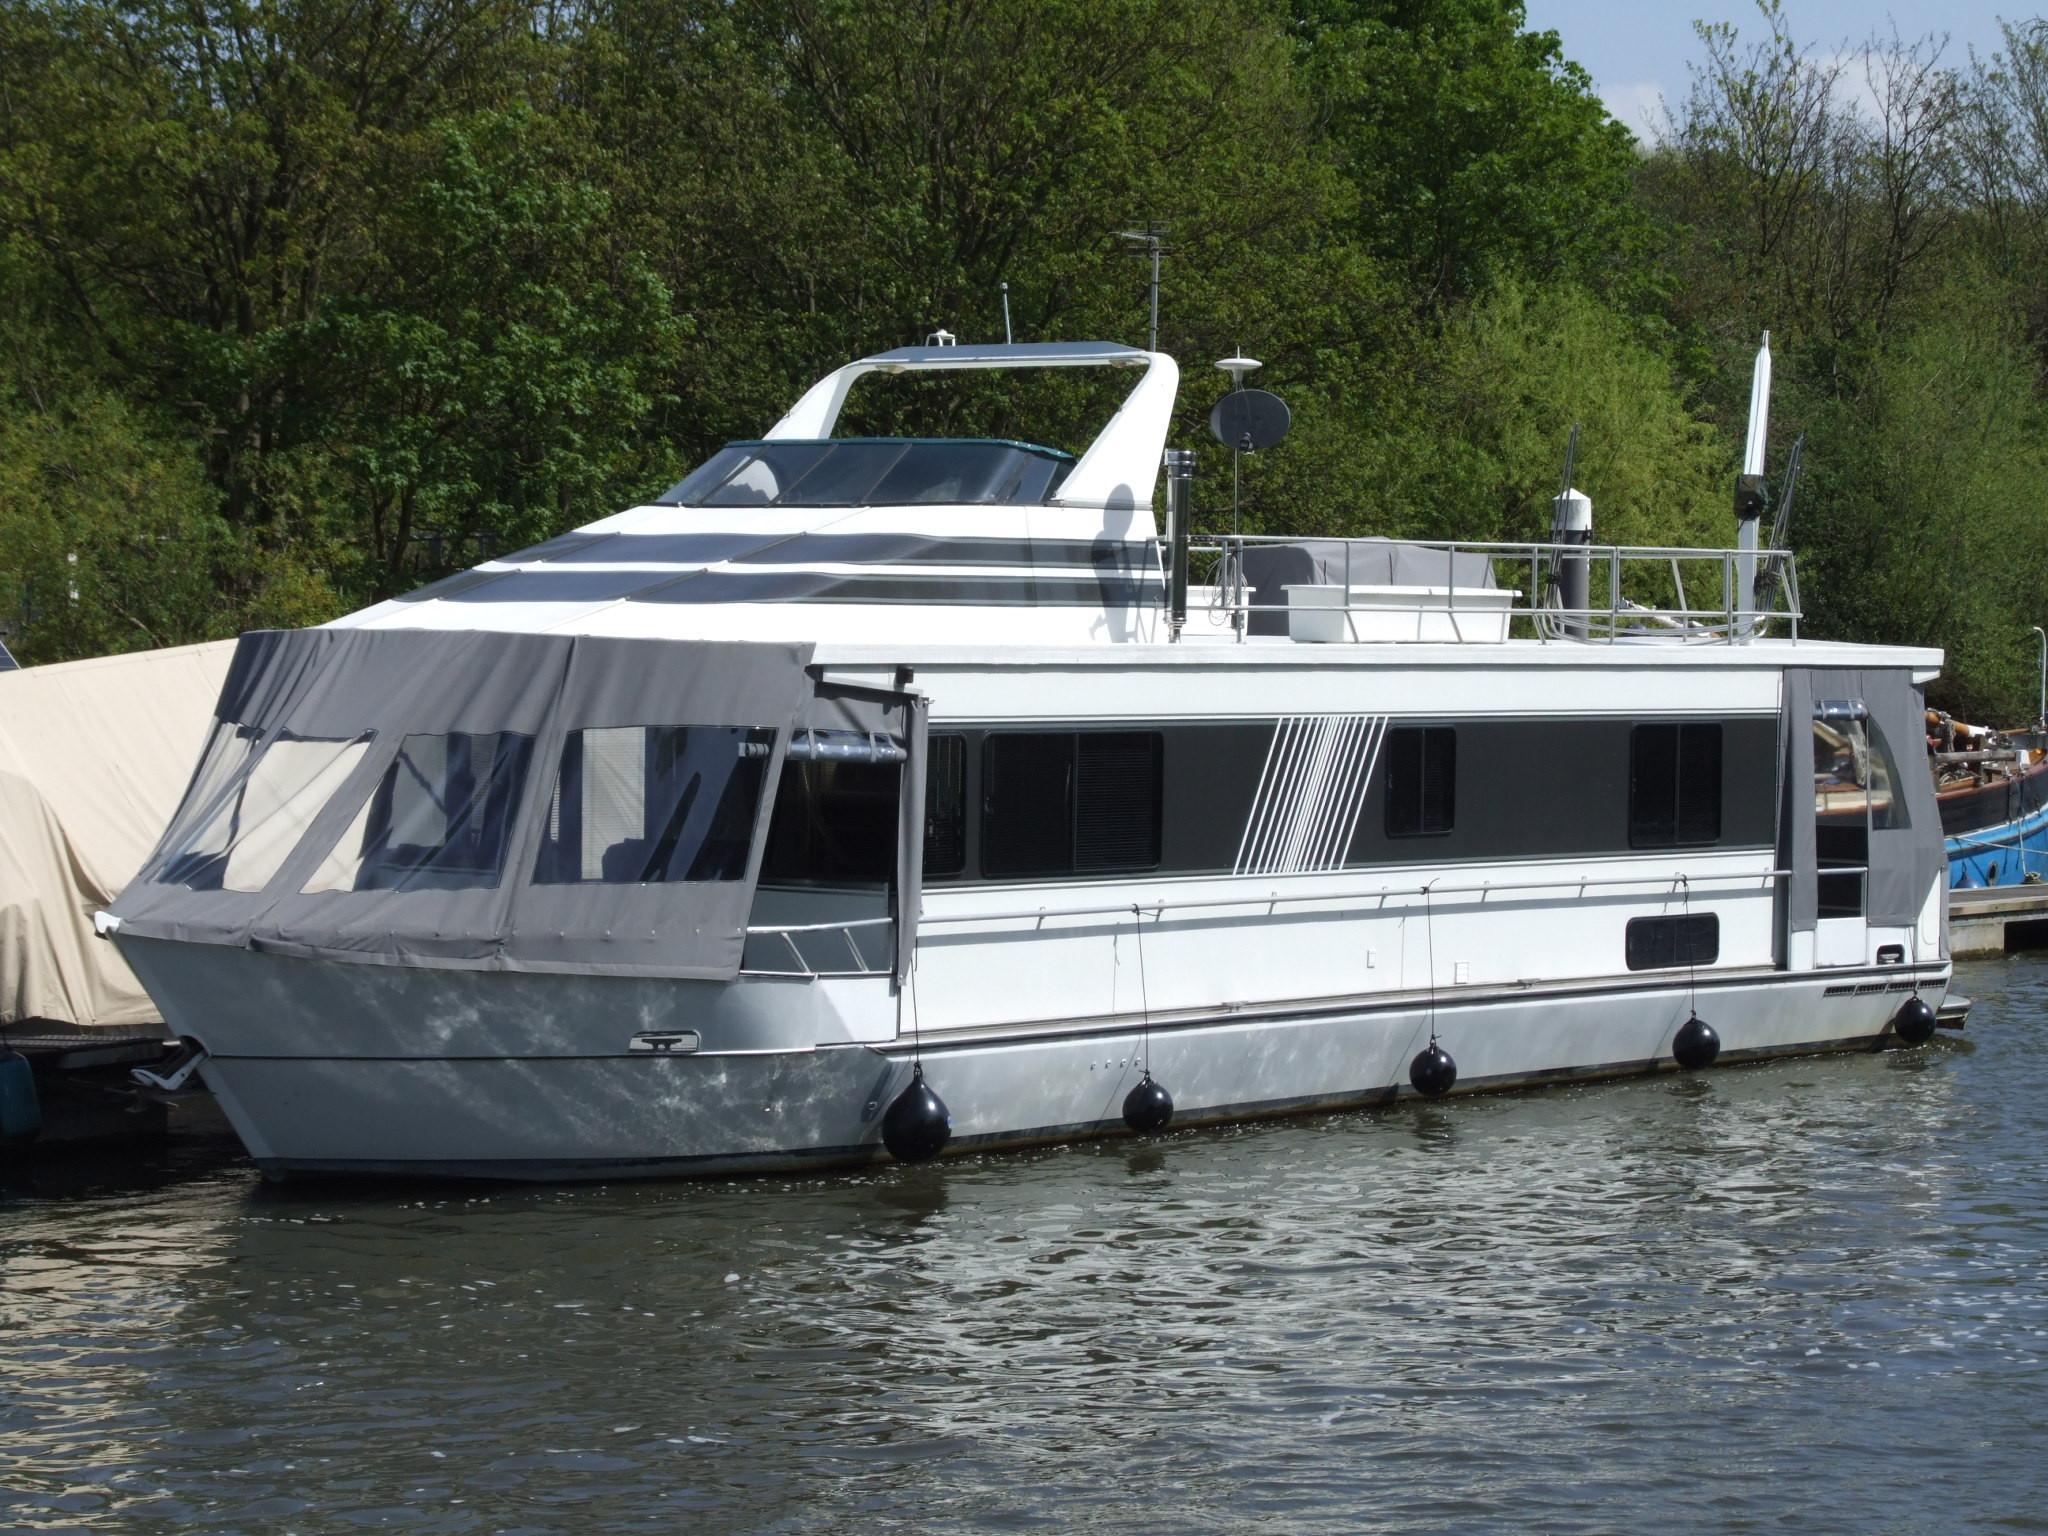 Monticello River Yacht 60